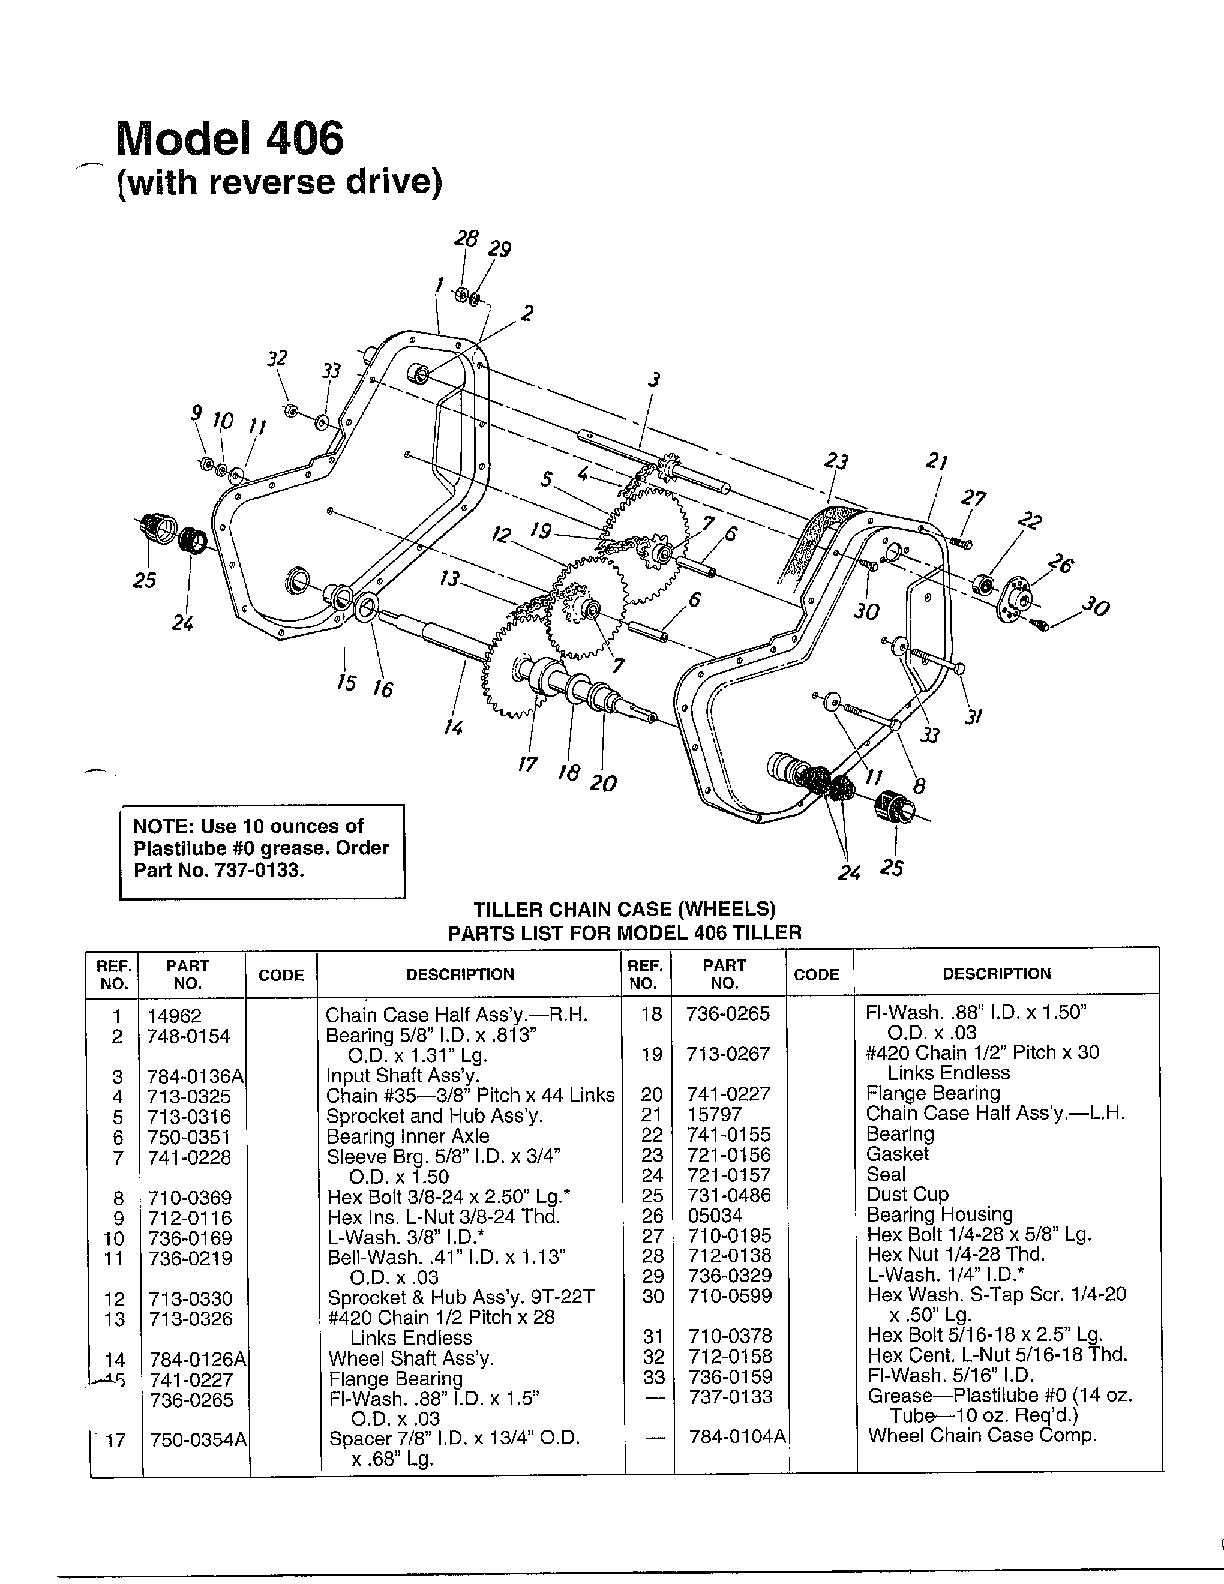 Mtd model 212-406-000 rear tine, gas tiller genuine parts